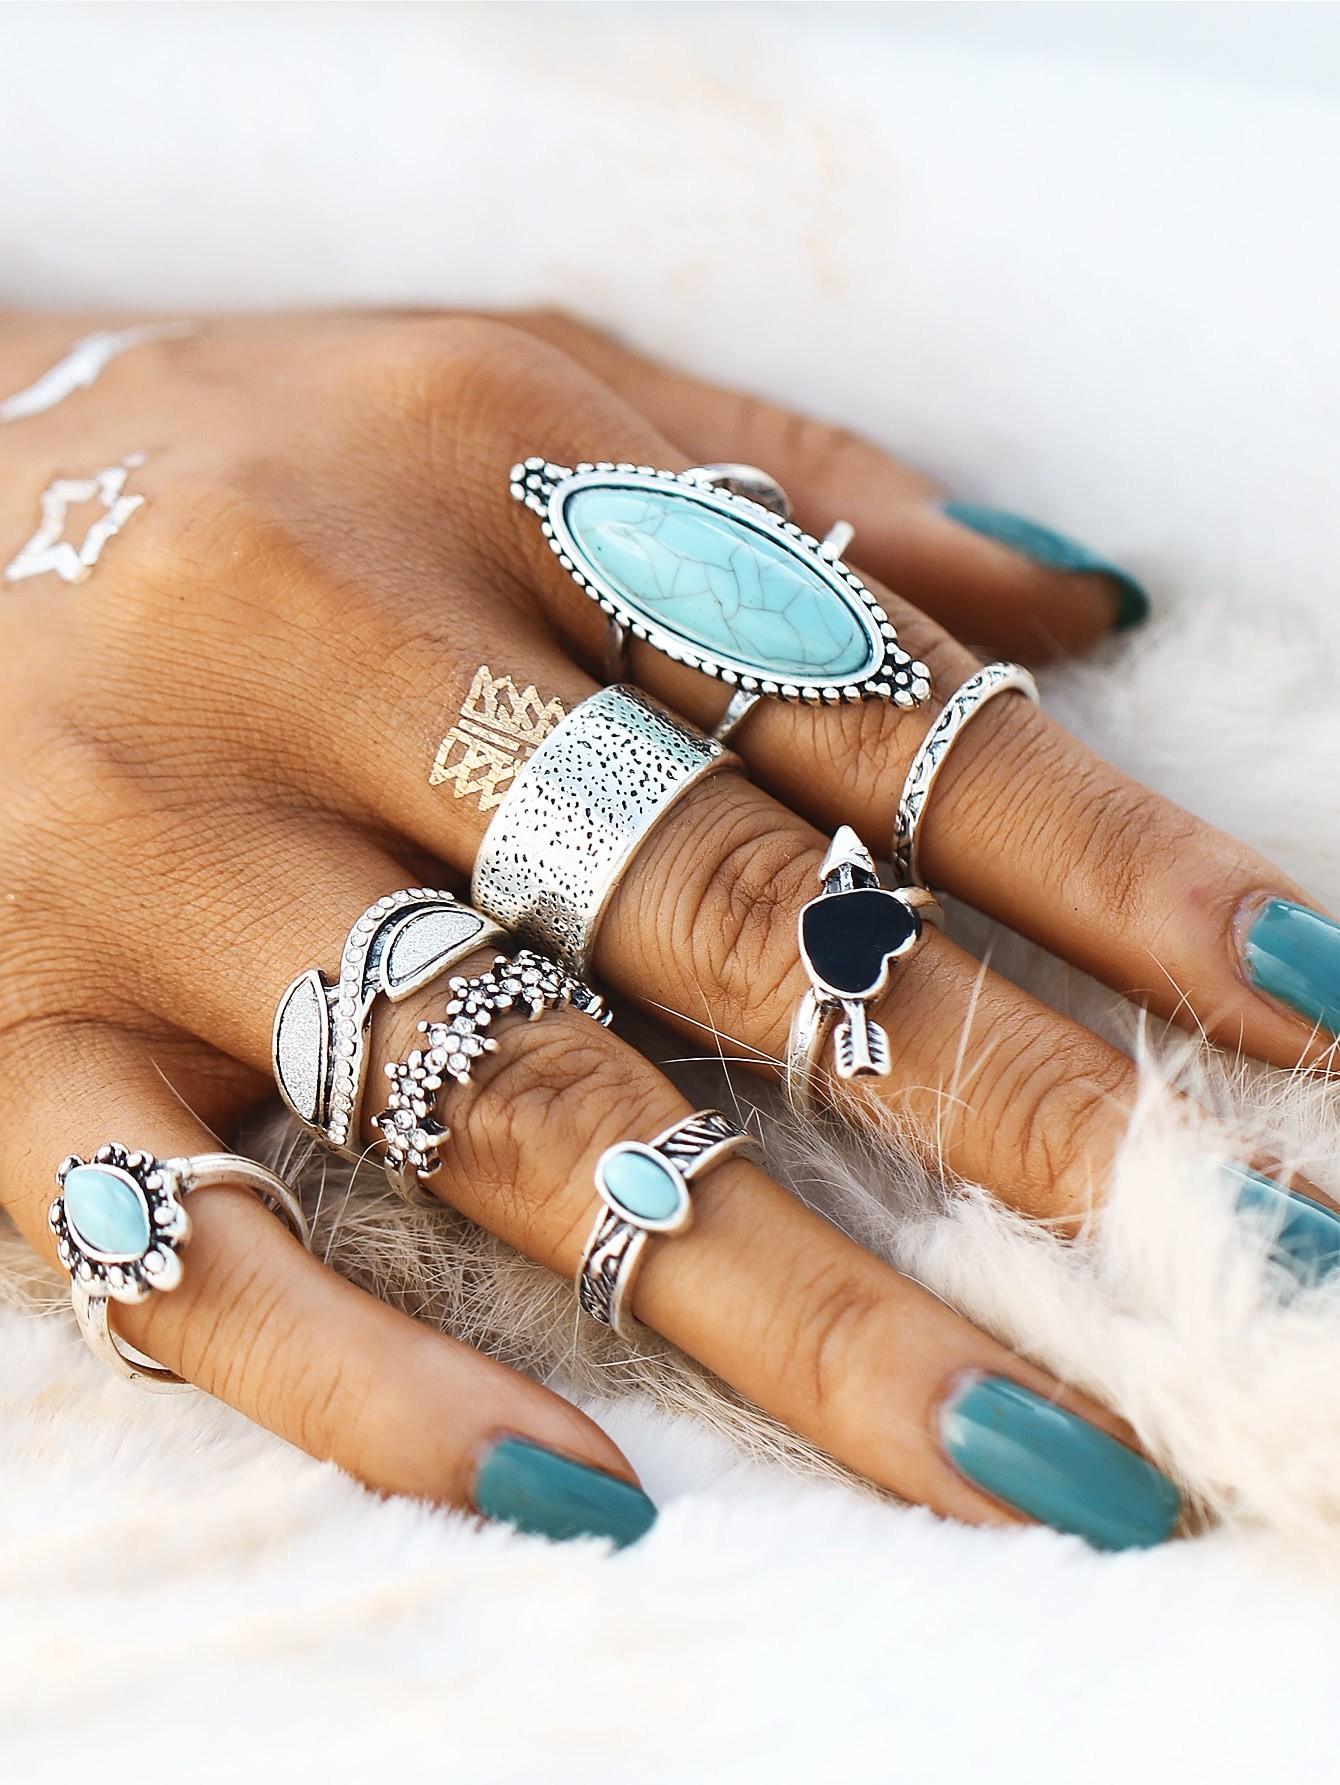 Heart & Flower Design Ring Set With Turquoise open heart design ring